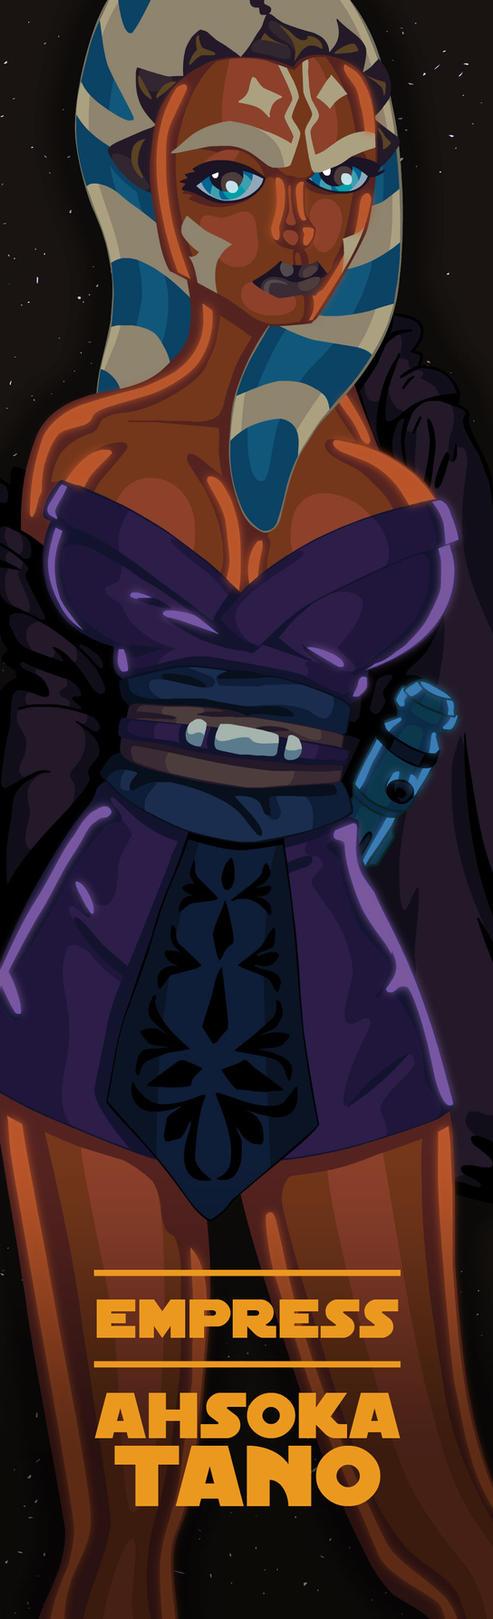 How Ahsoka became the empress by juhaszmark